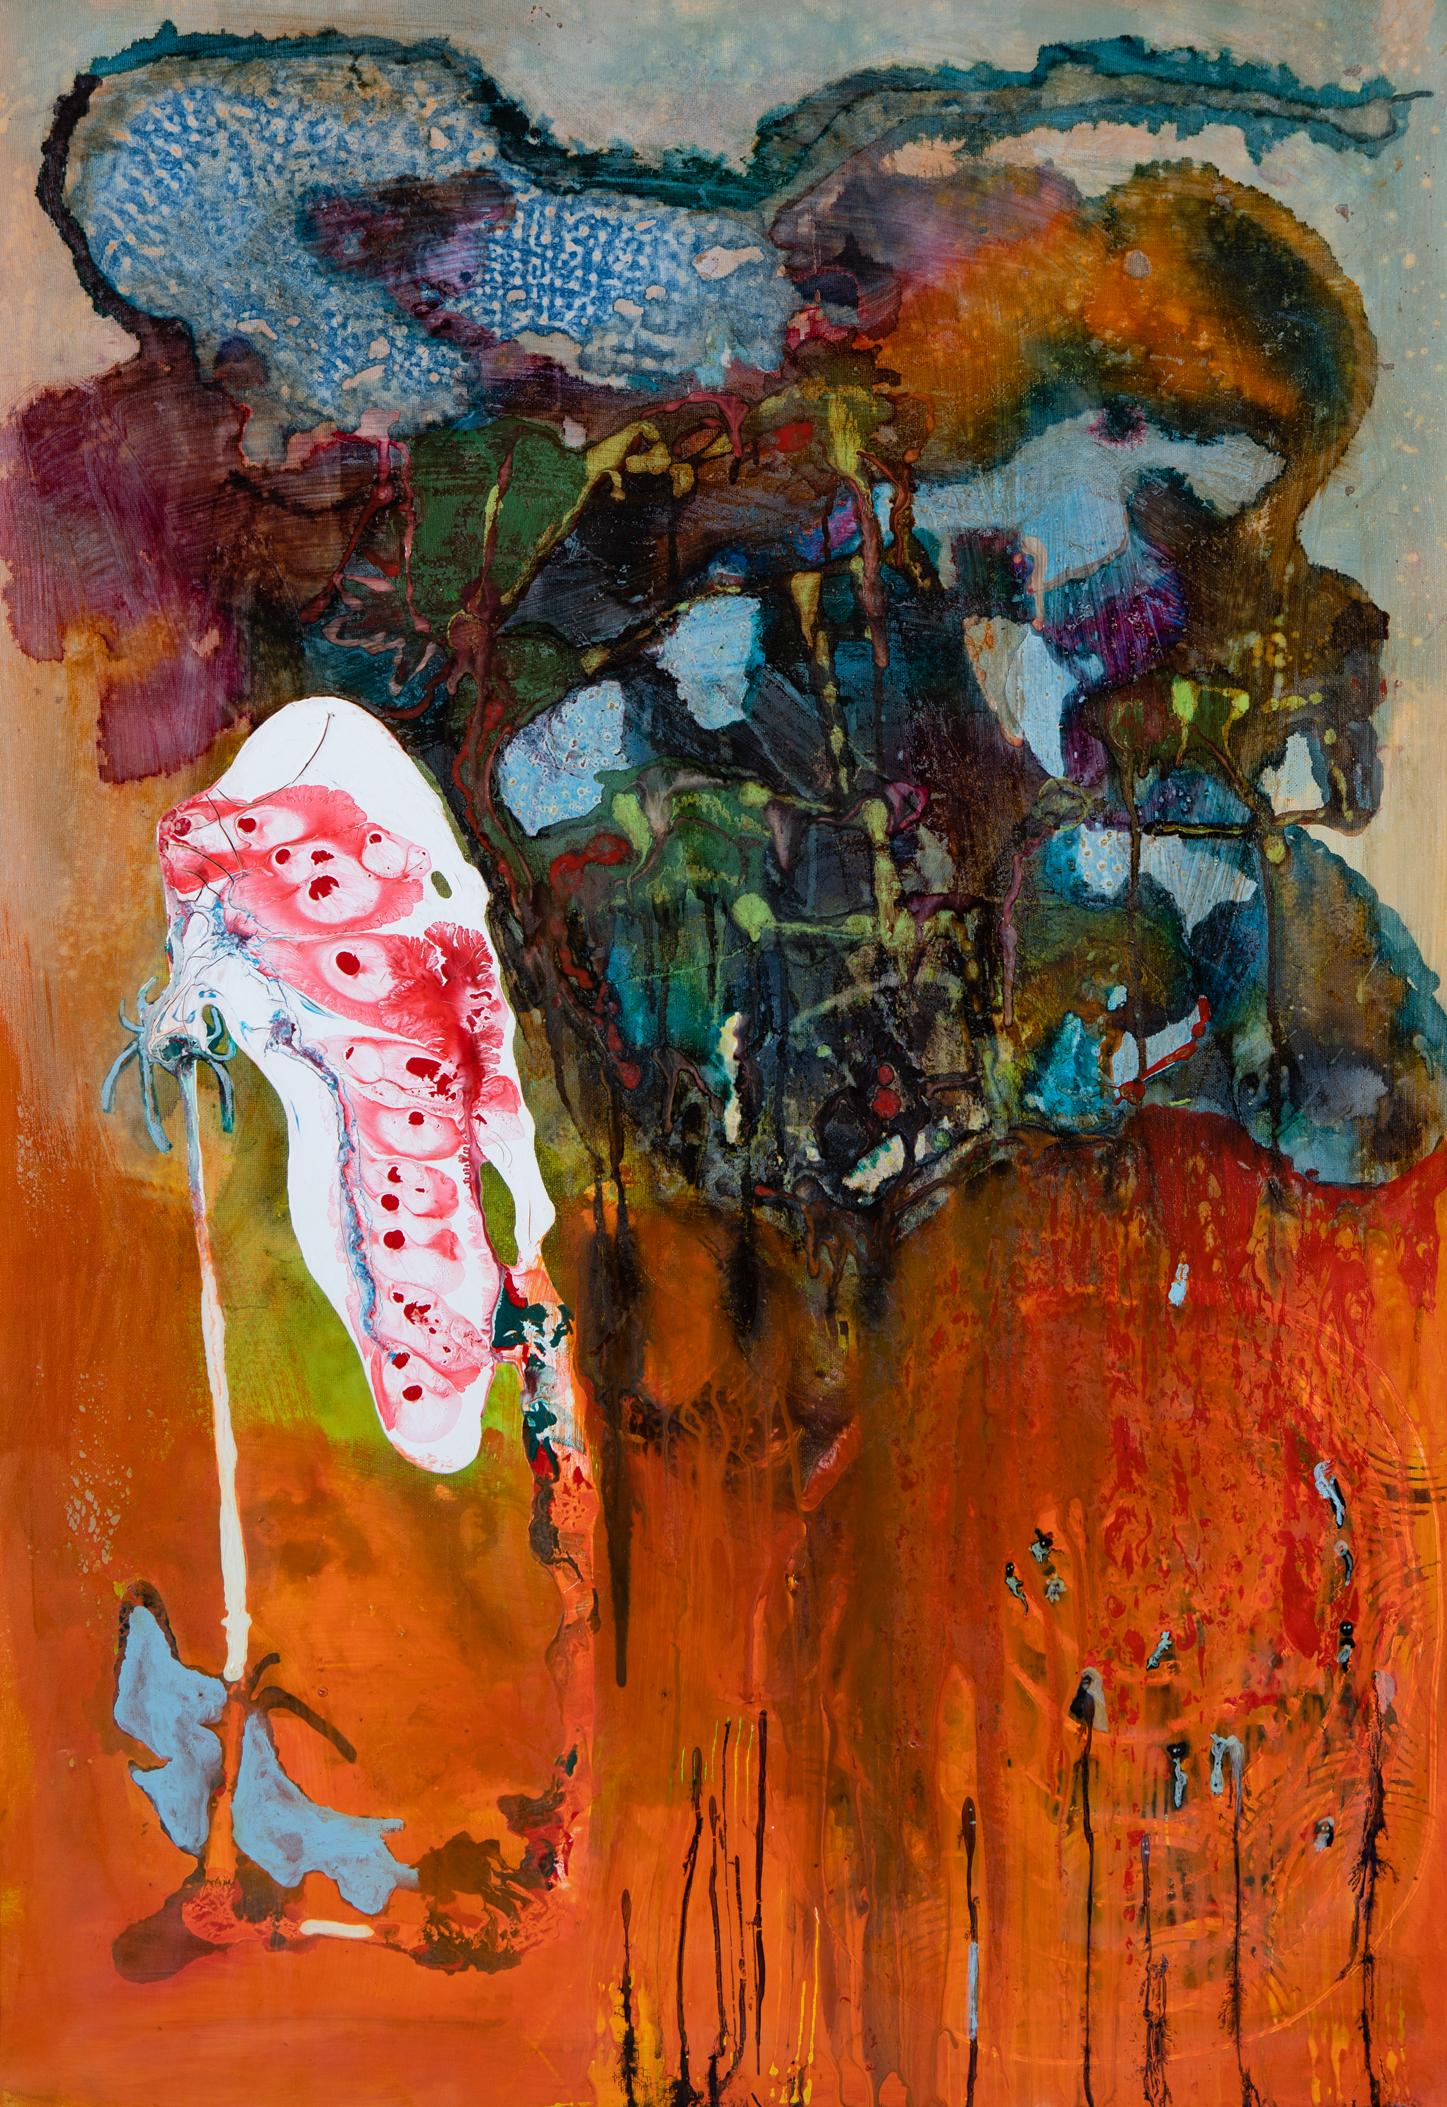 Kokon - 2017Acryl auf Leinwand70 x 100 cm